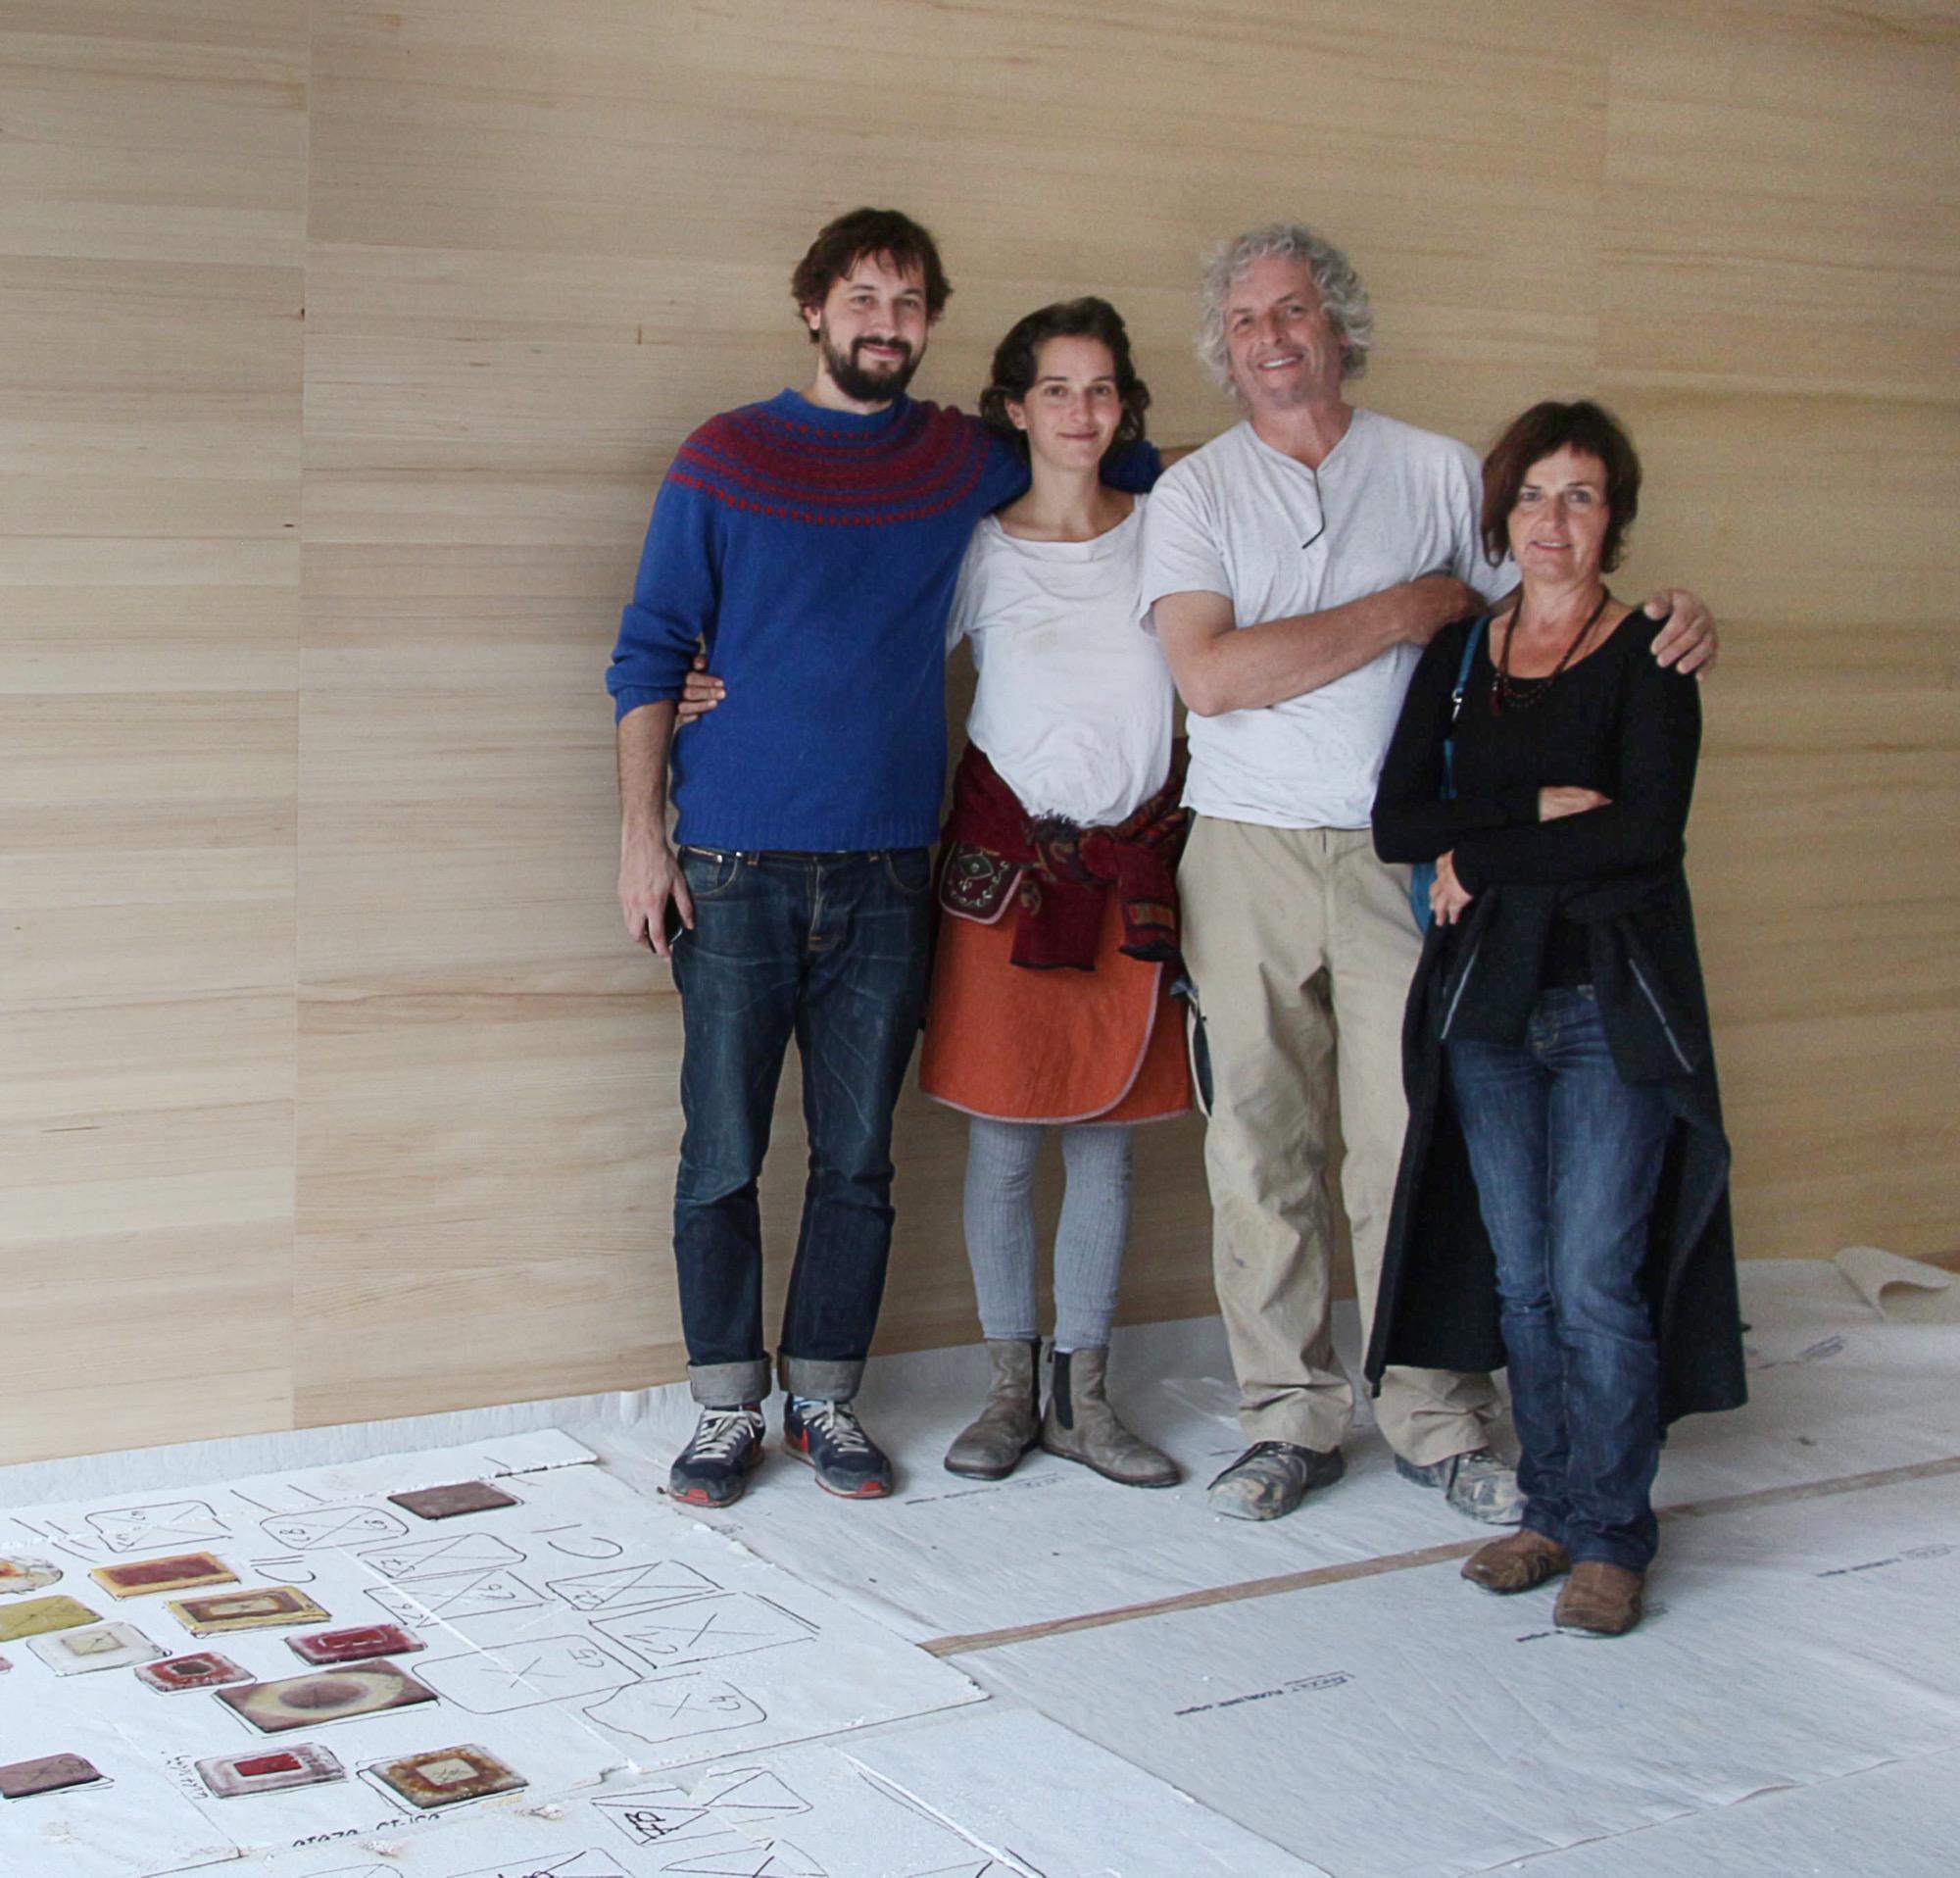 Art runs in the family: Marta, Martin, Anna Pia, and Sebastian Rauch